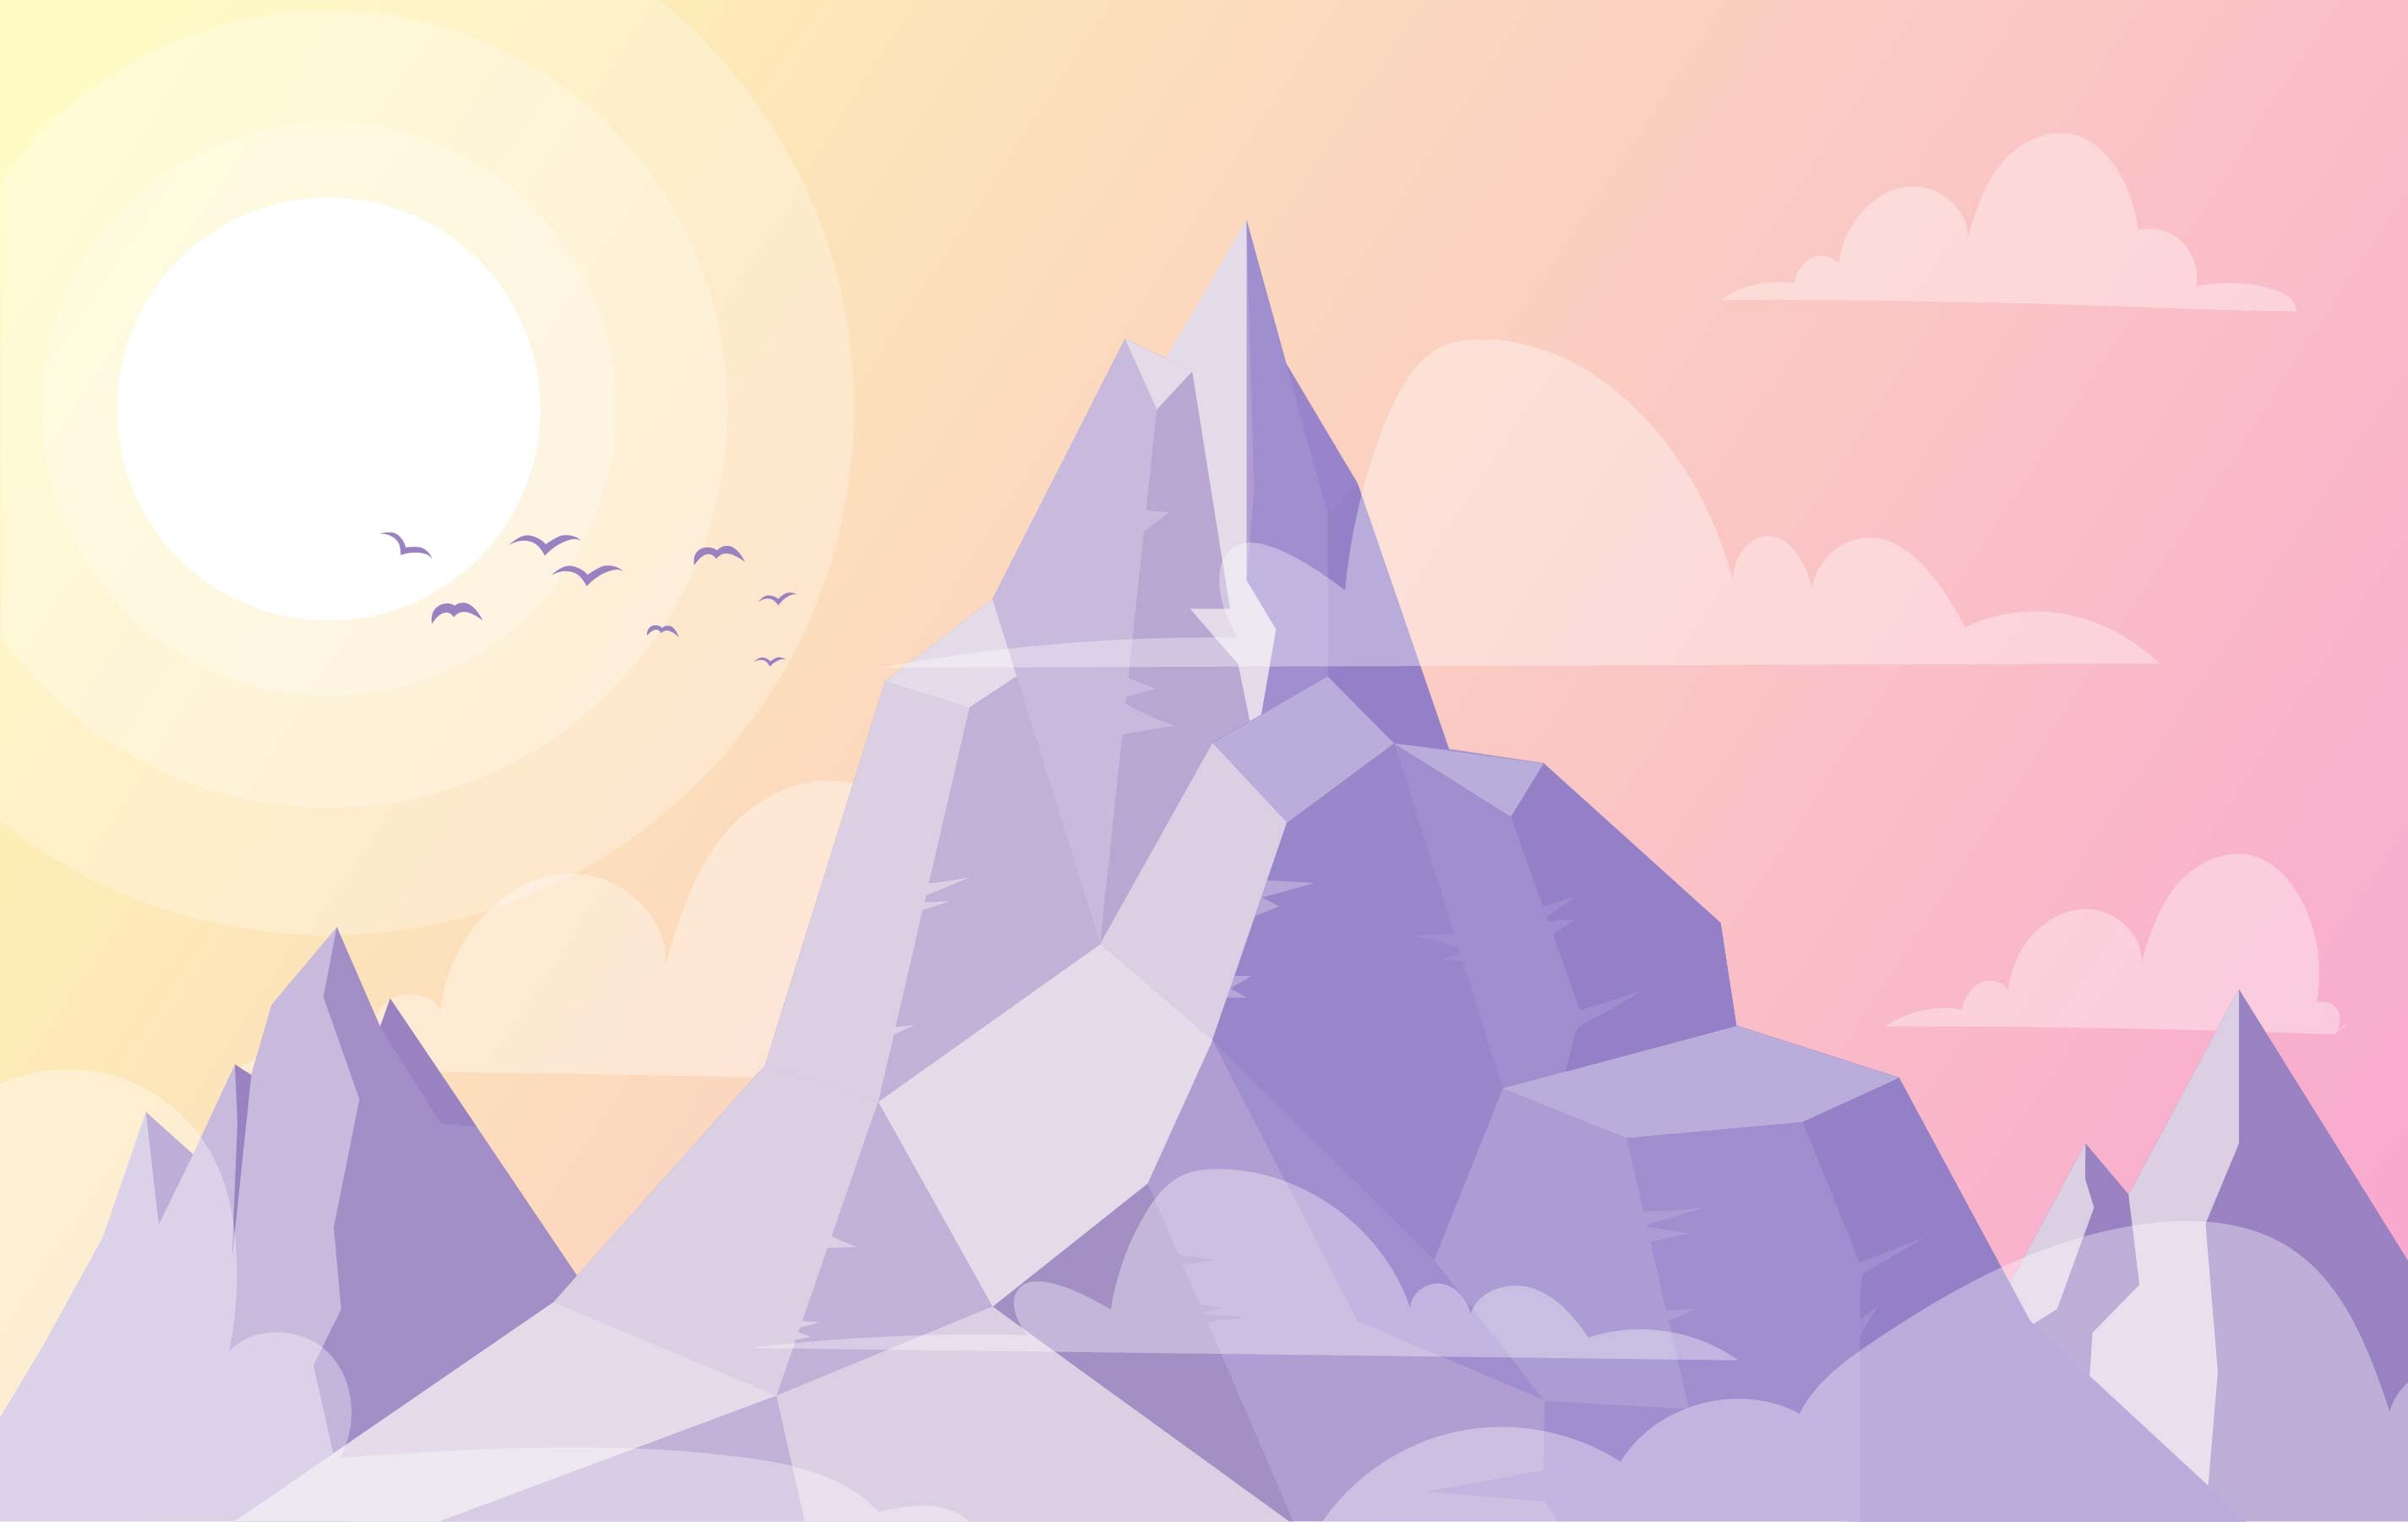 Landscape Illustration Vector Free: Vector Mountain Landscape Illustration